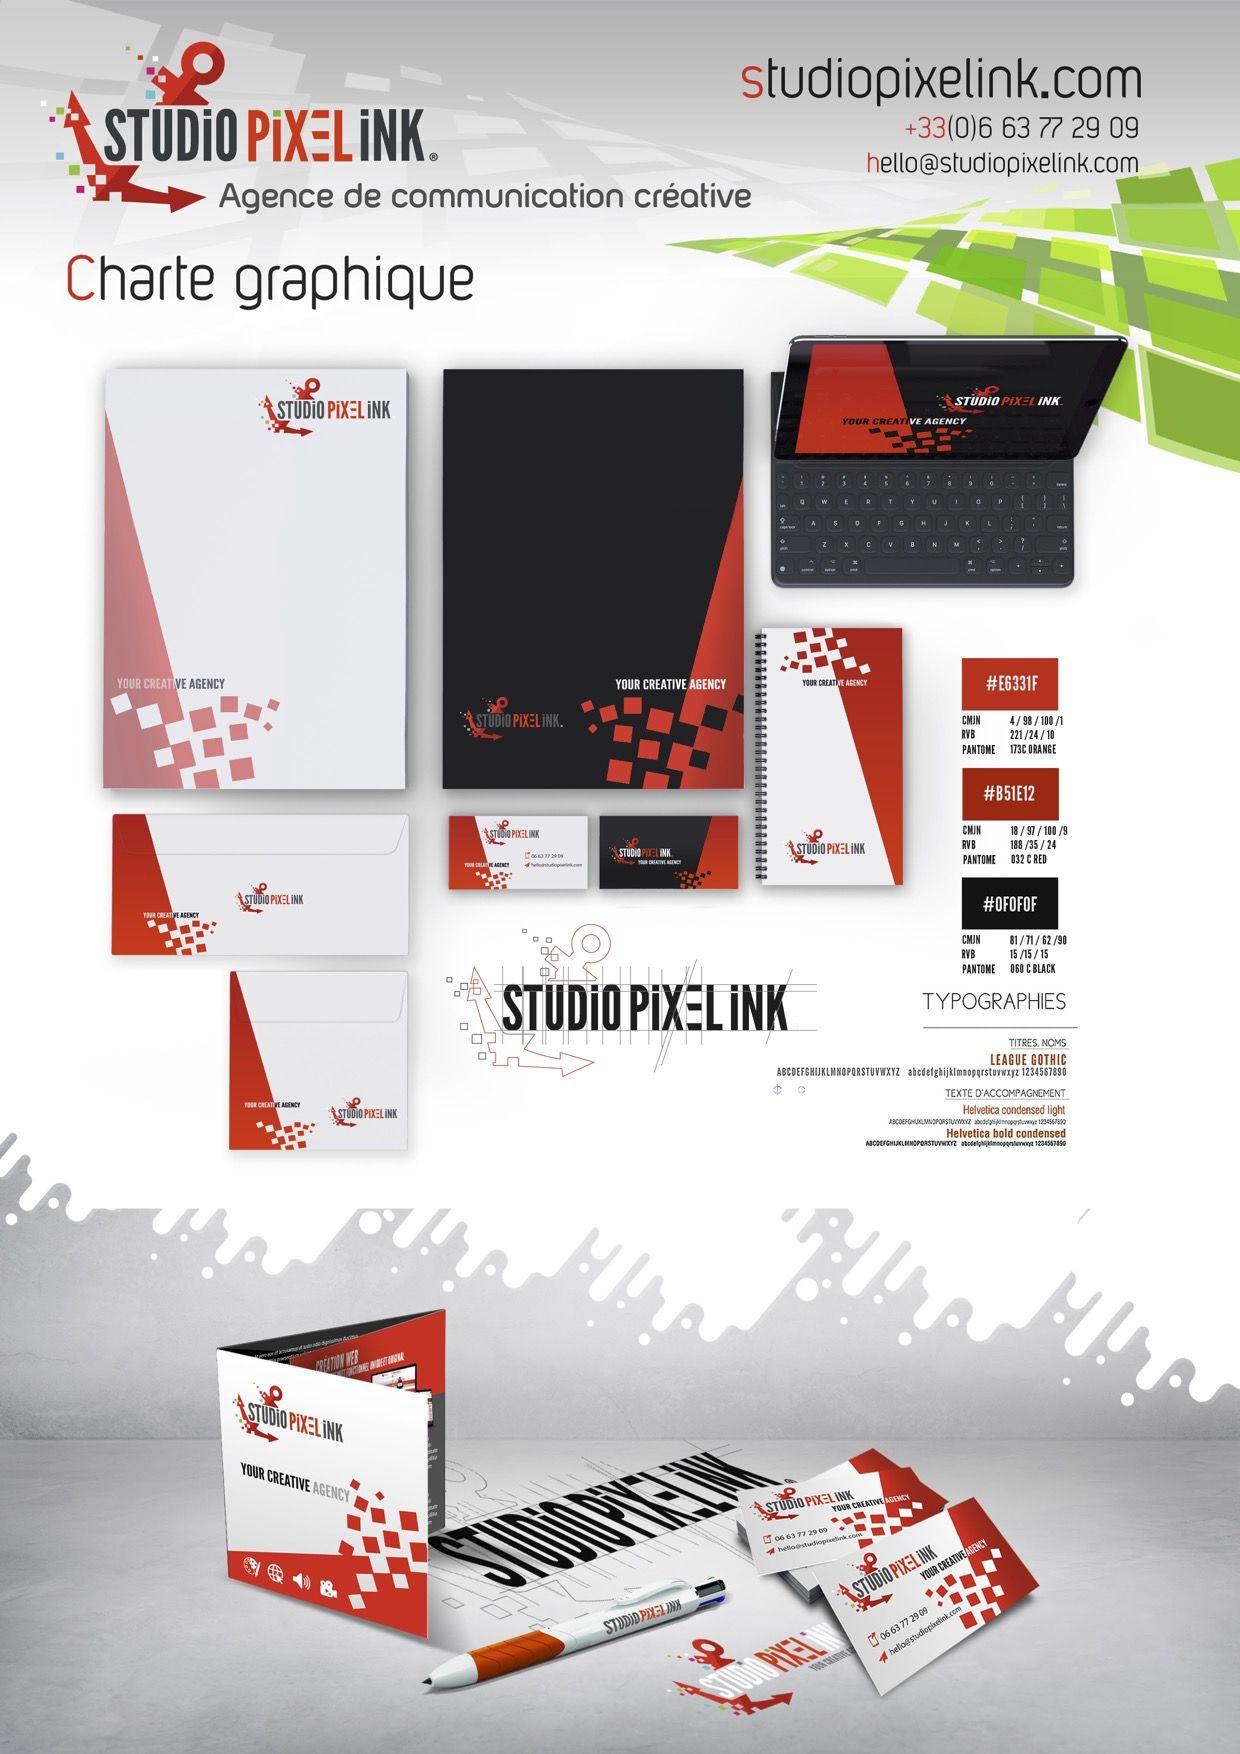 CHARTE GRAPHIQUE CREATION STUDIO PIXEL INK